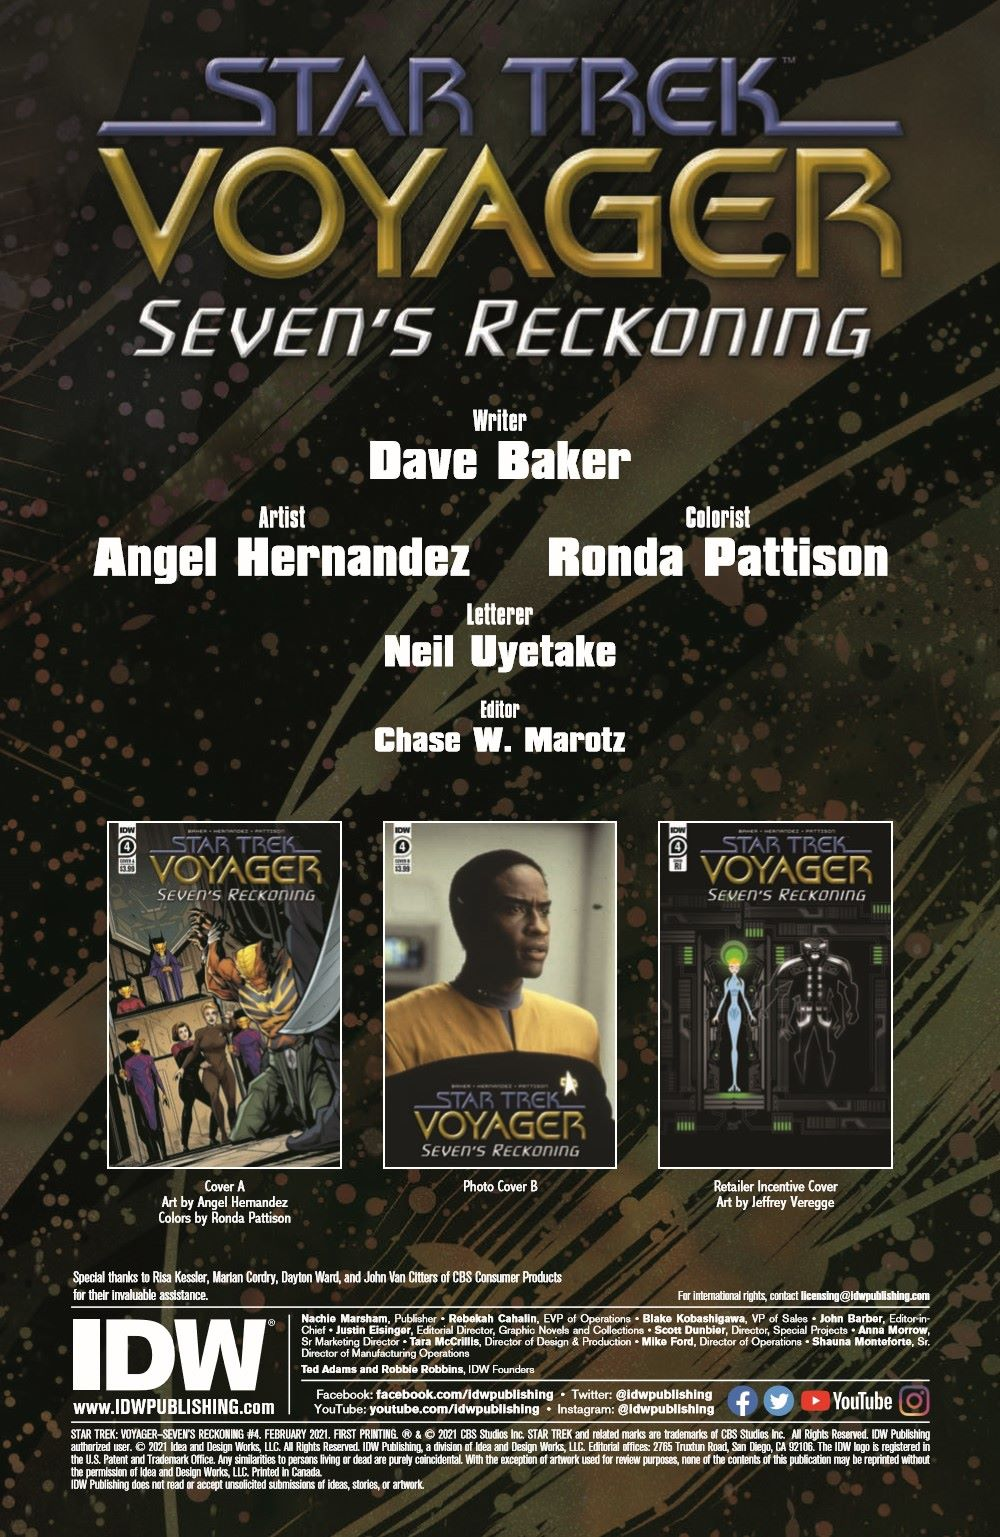 ST_Voyager_SR04-pr-2 ComicList Previews: STAR TREK VOYAGER SEVEN'S RECKONING #4 (OF 4)